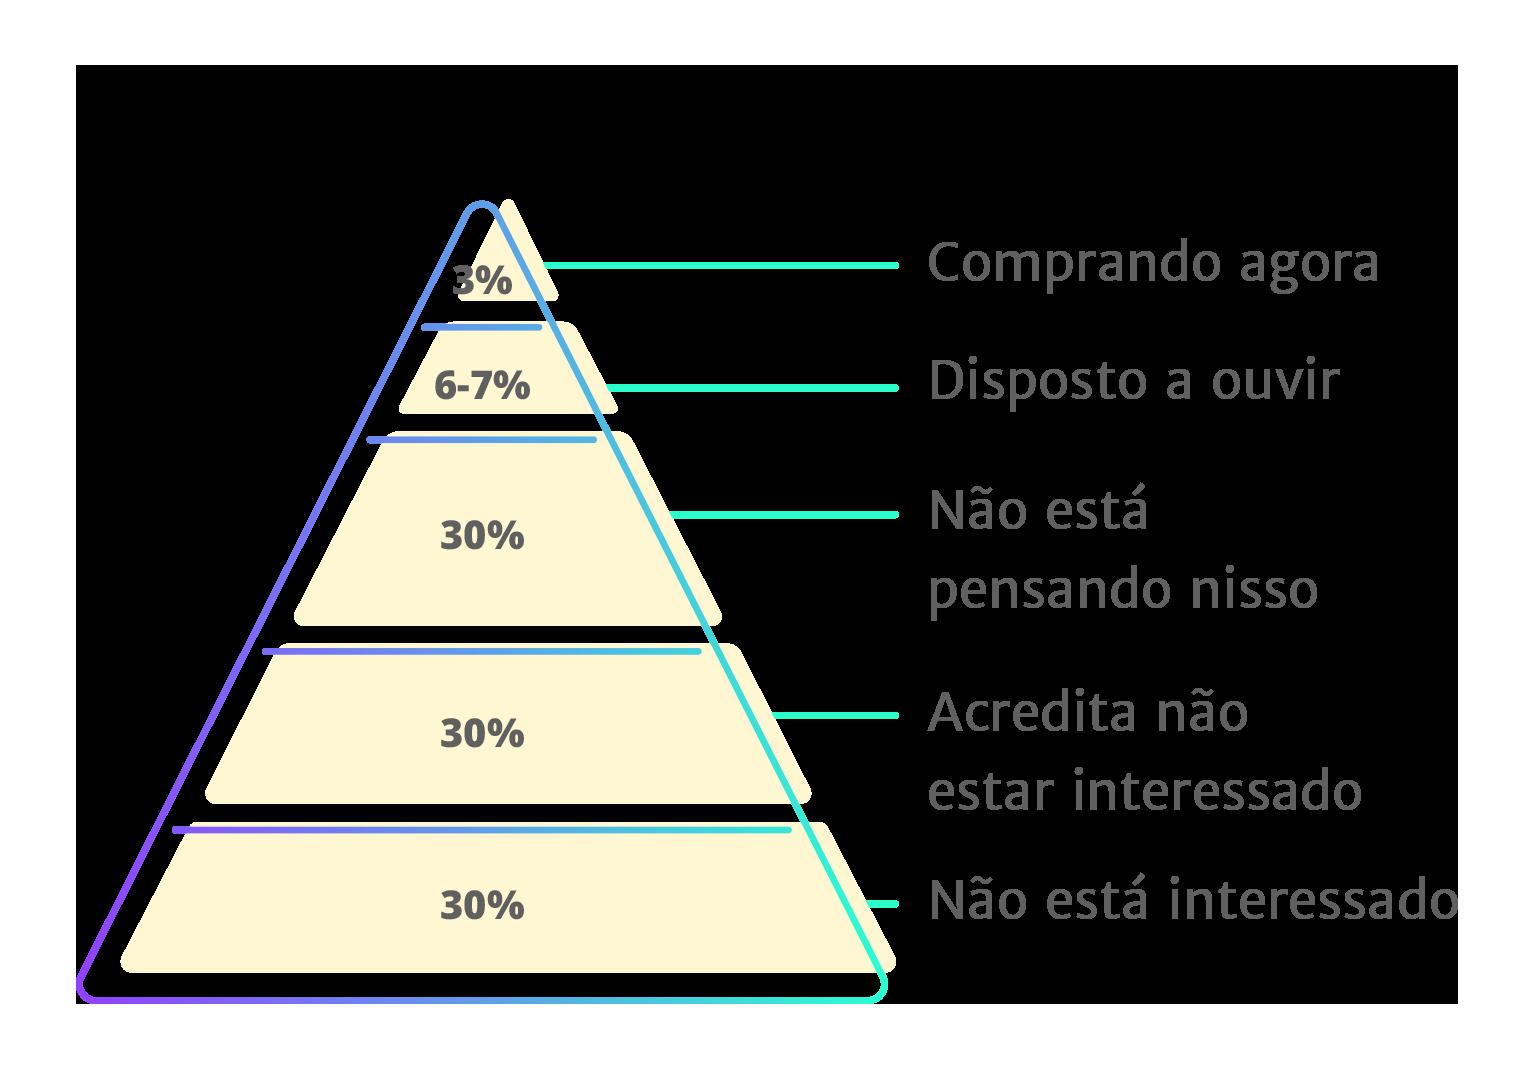 Pirâmide do momento de mercado